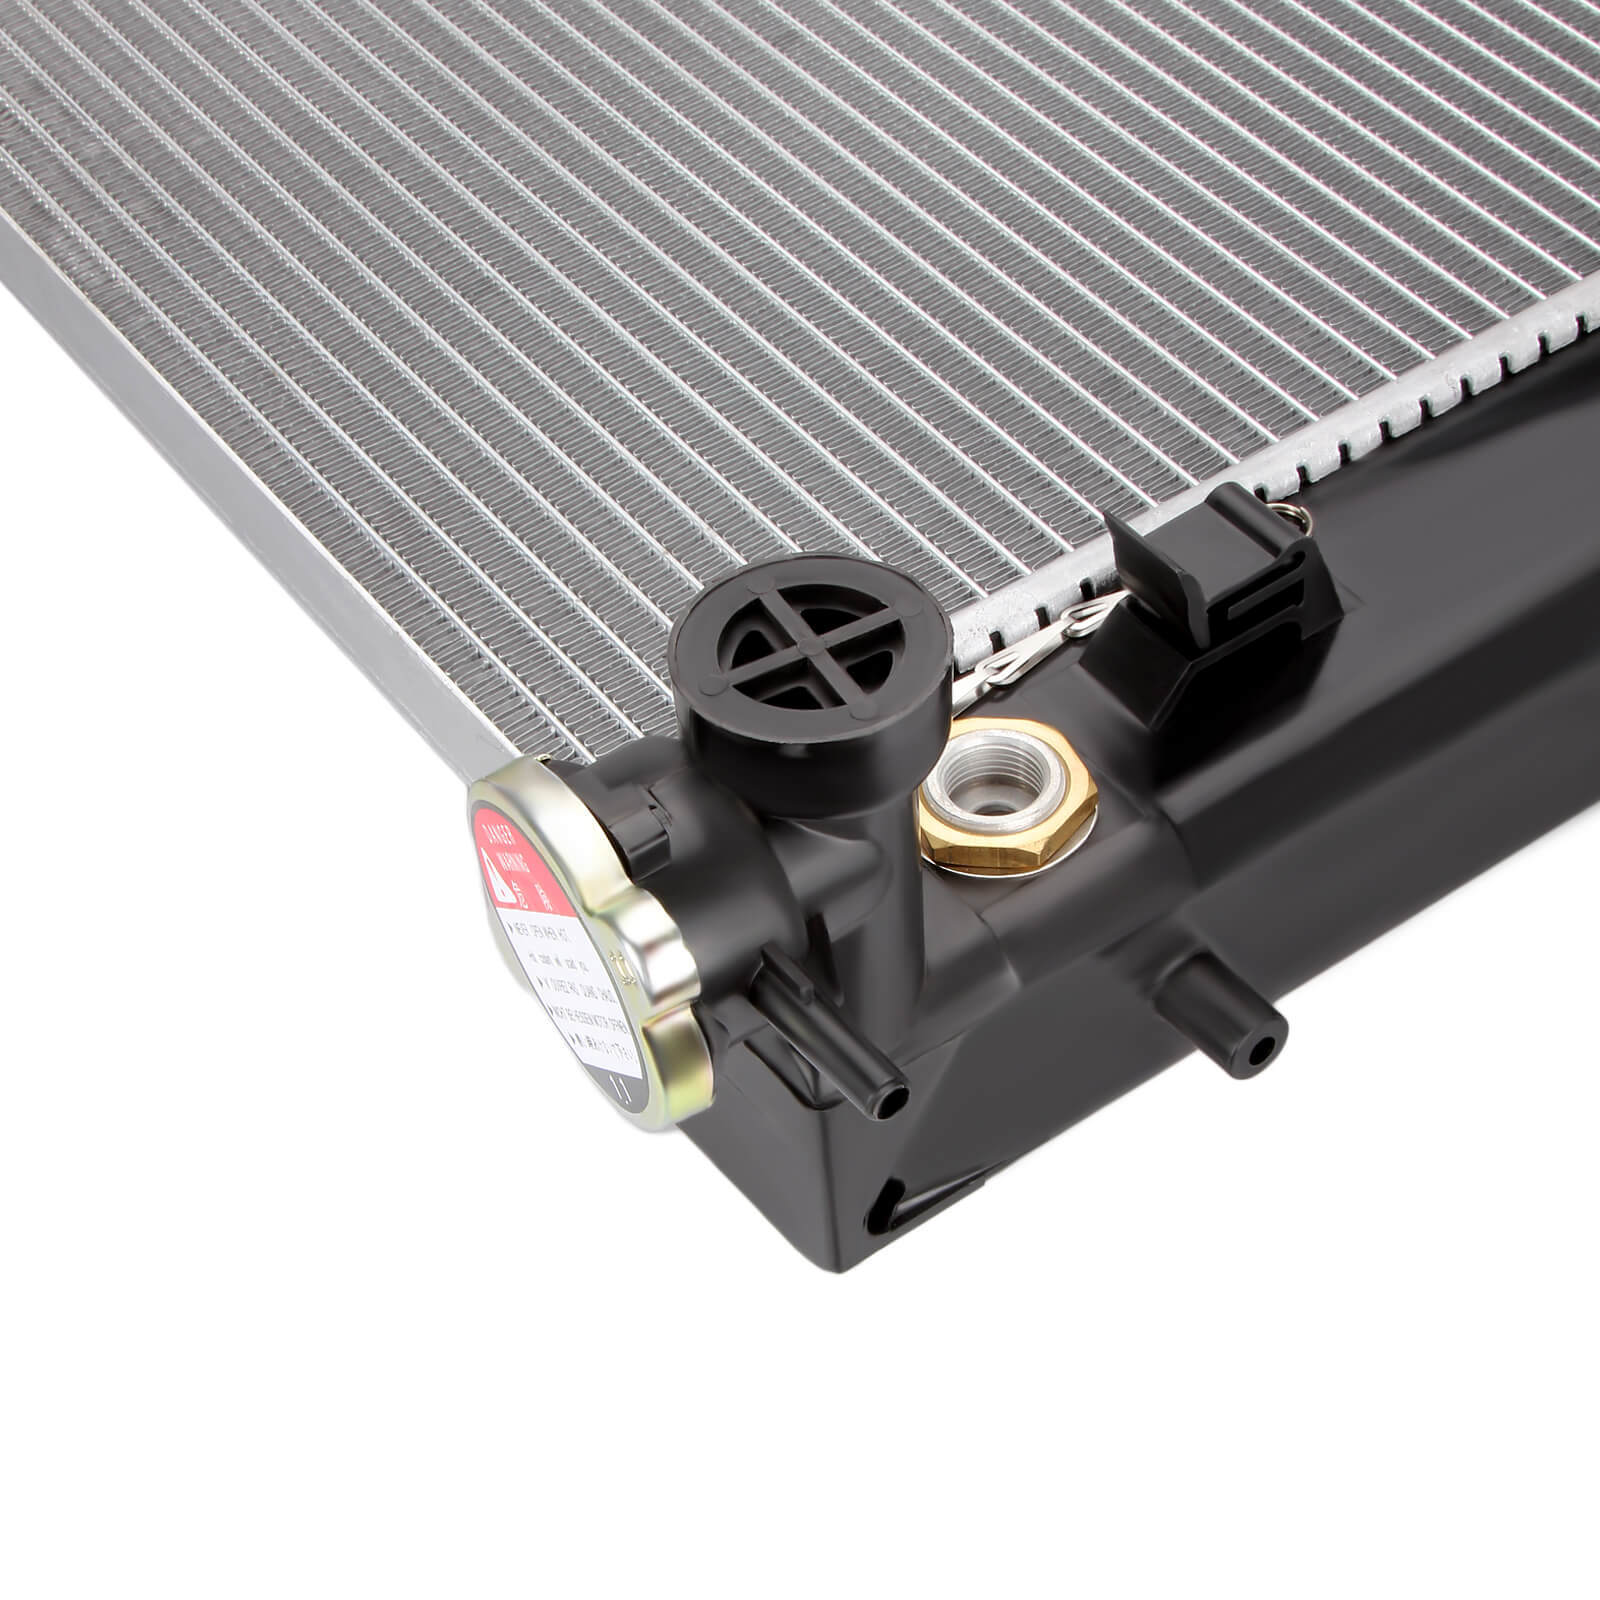 Custom wh vx holden radiator Dromedary quality